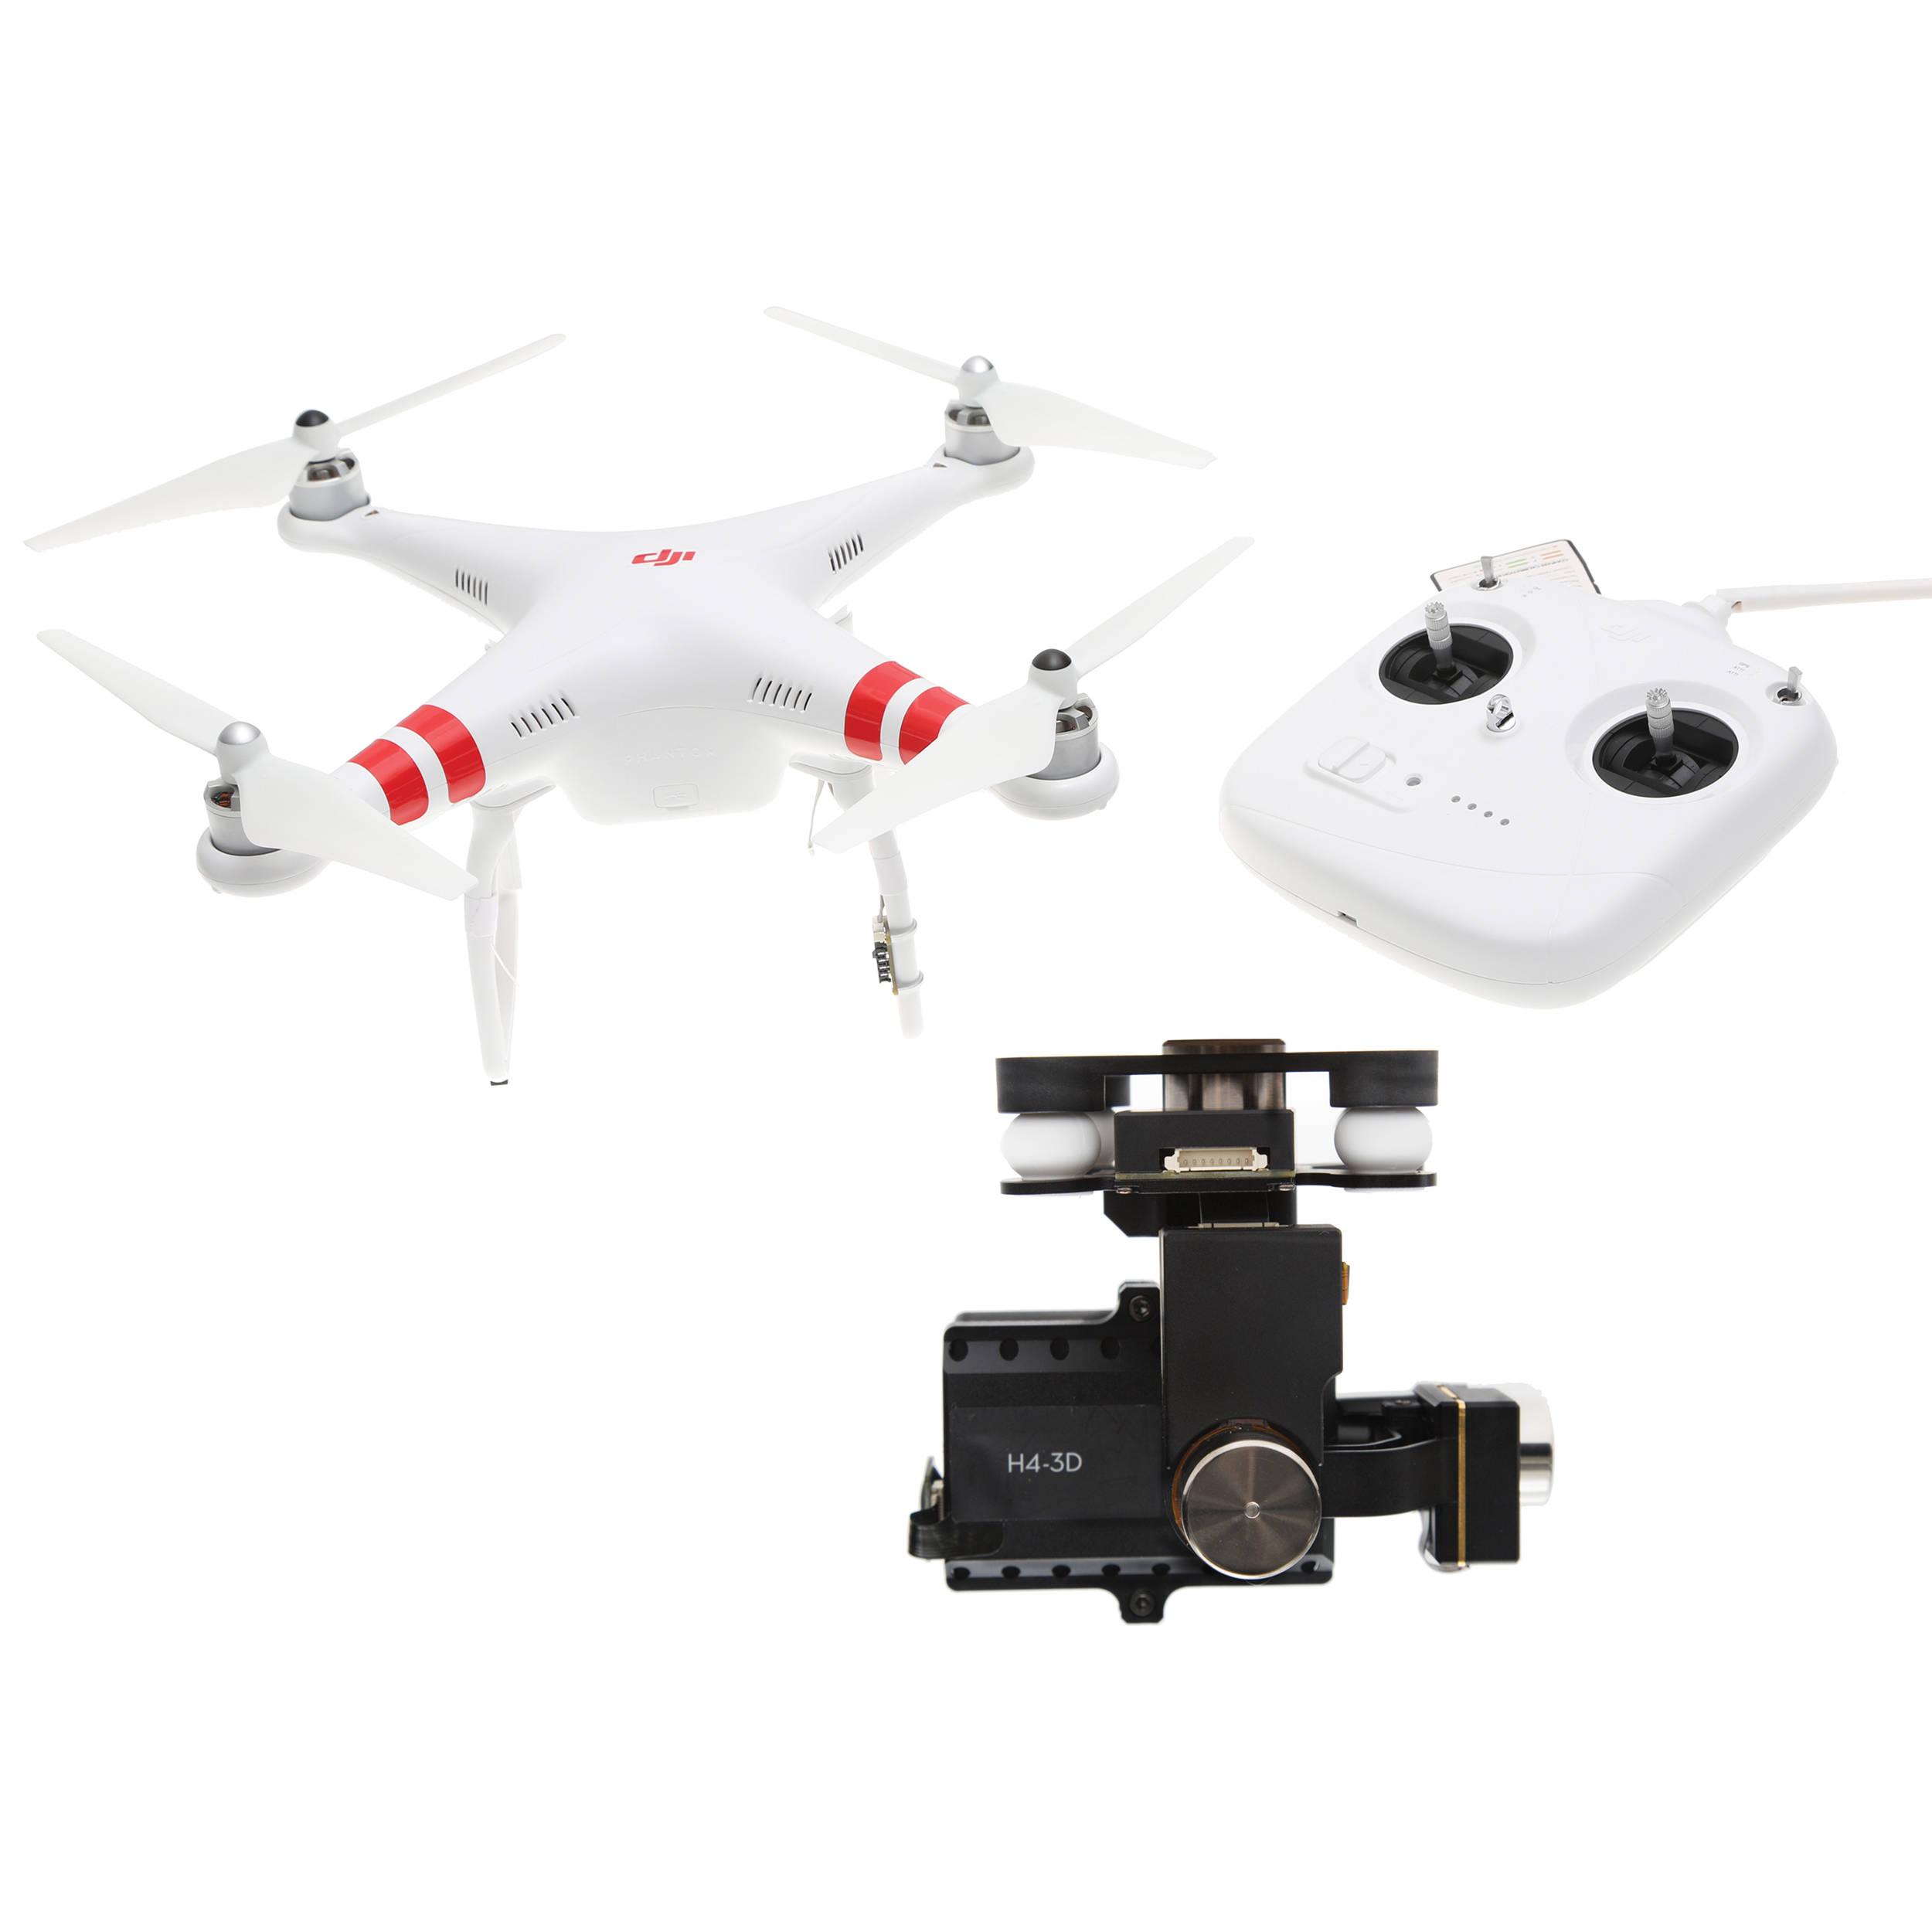 Dji phantom 2 gimbal gopro 4 mavic air combo standard характеристики камеры